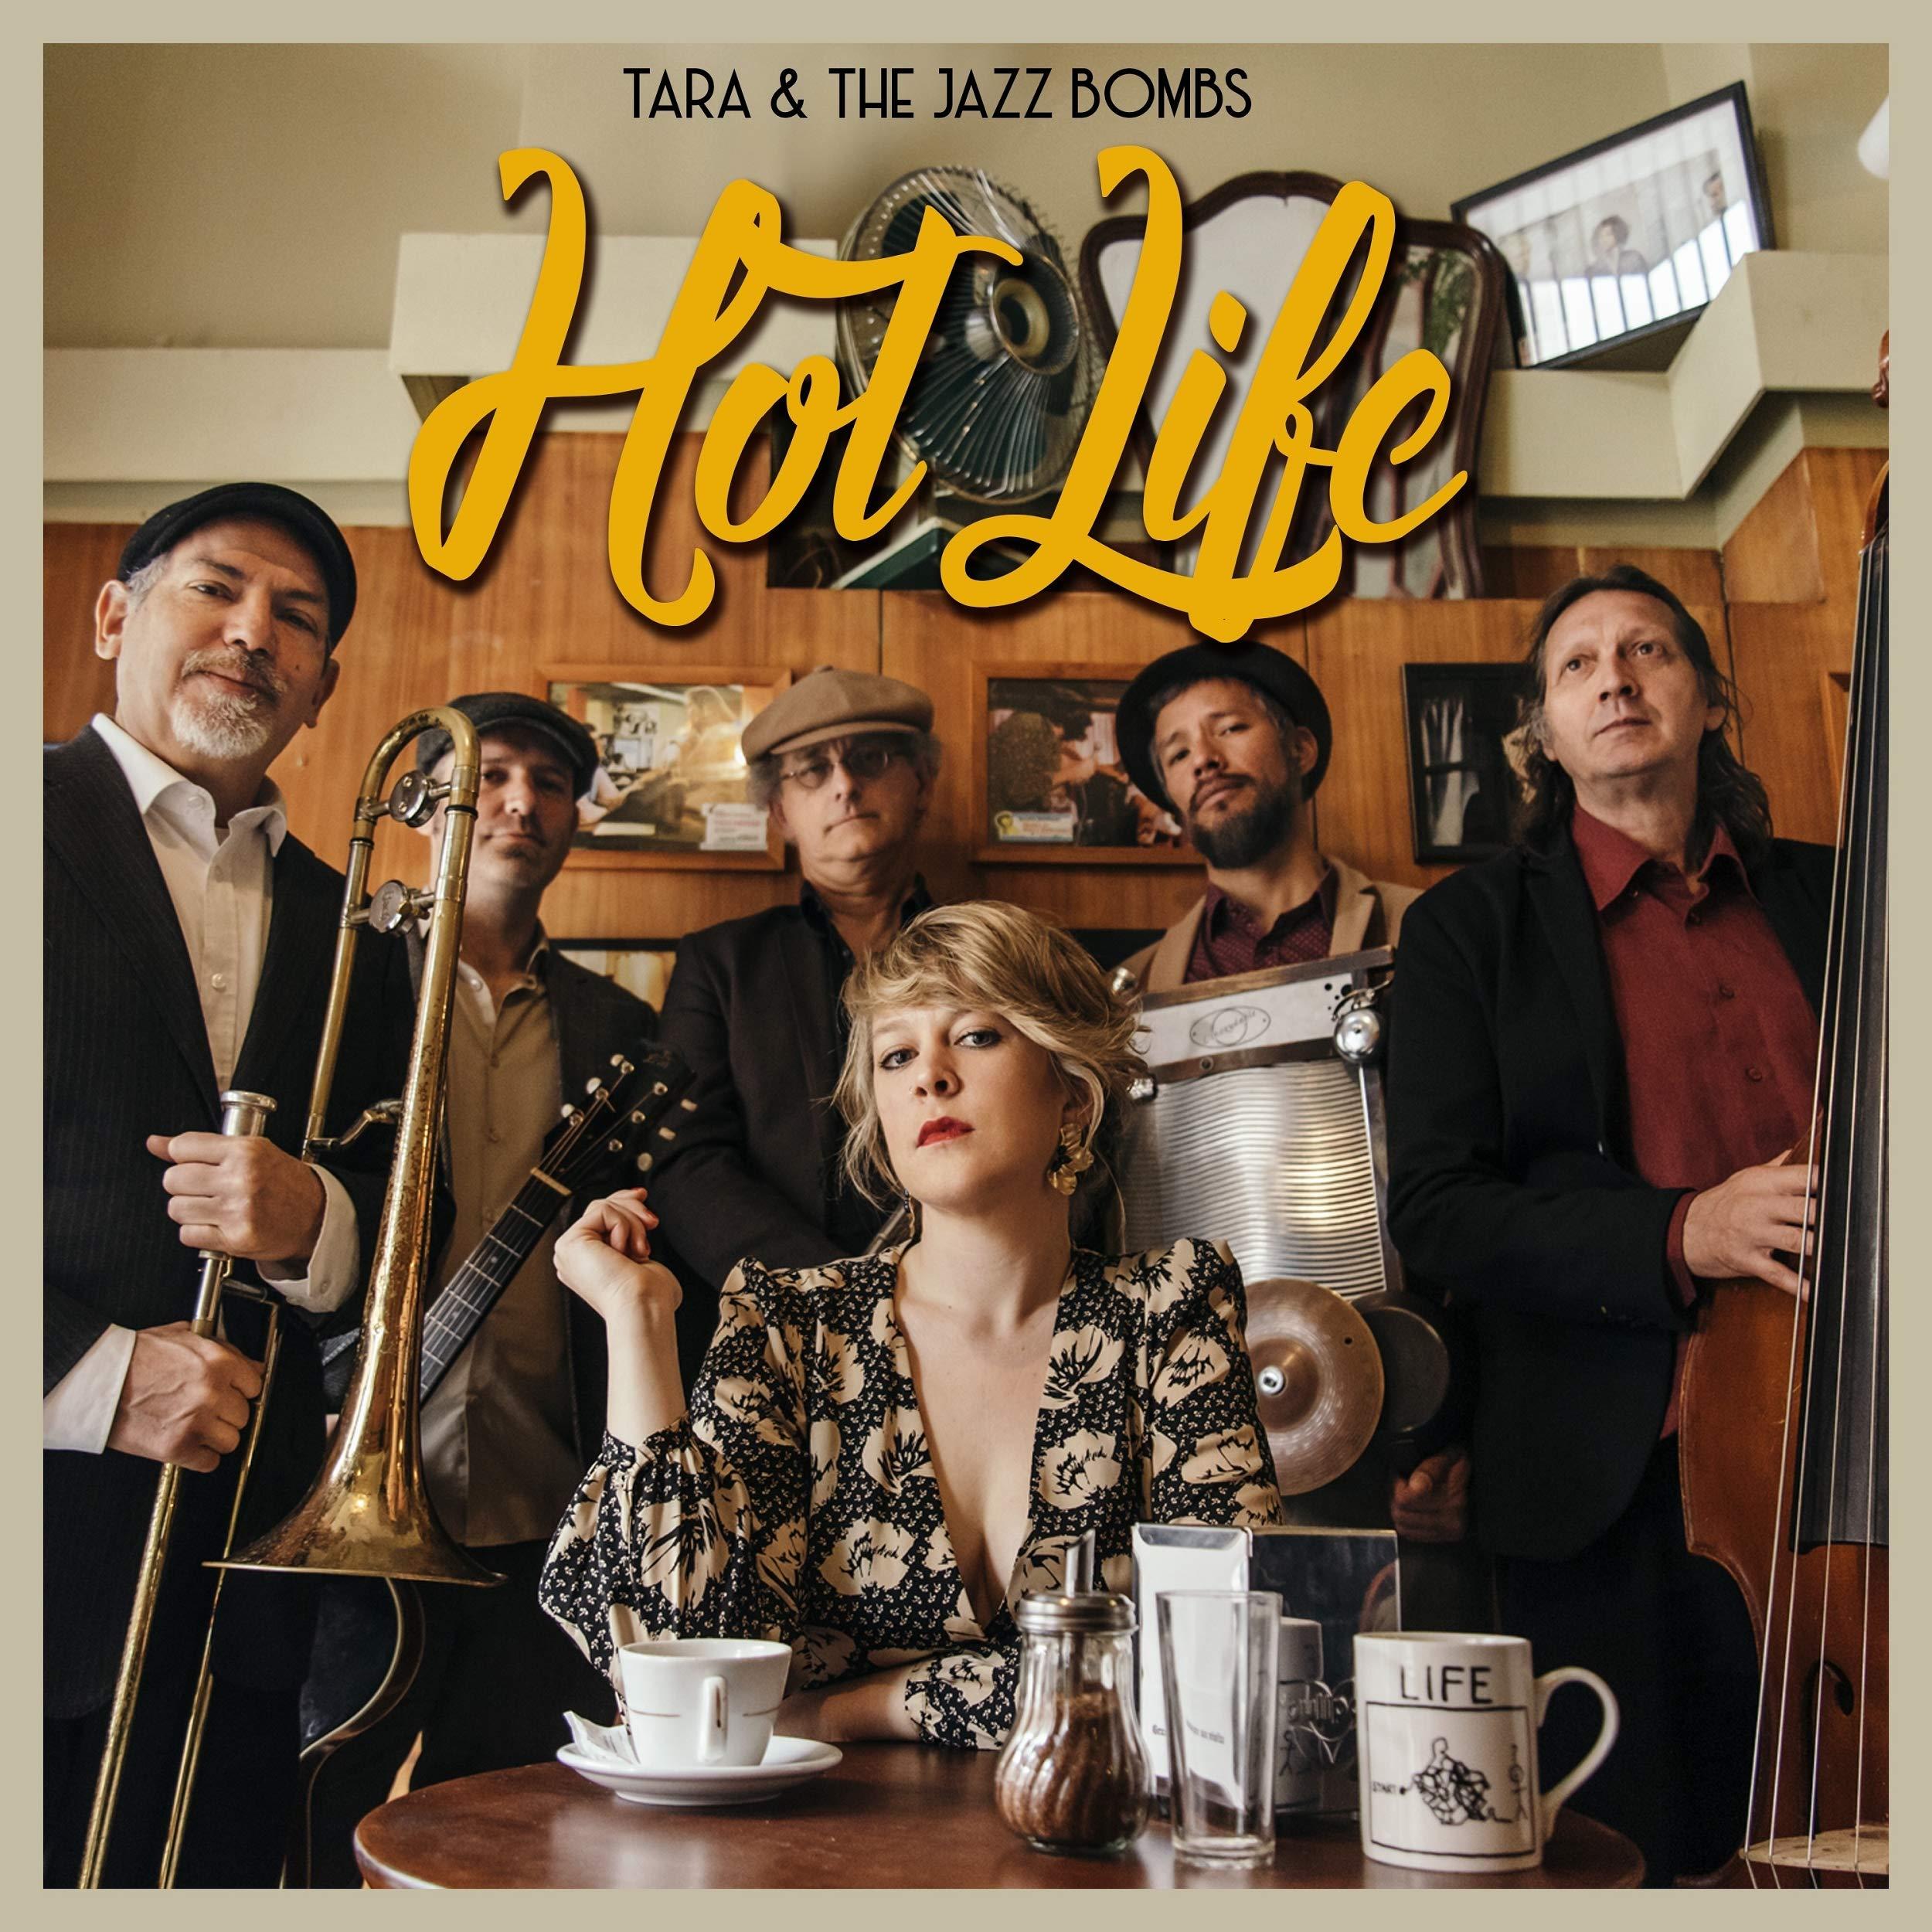 Tara & The Jazz Bombs - Hot Life (2020) [FLAC] Download